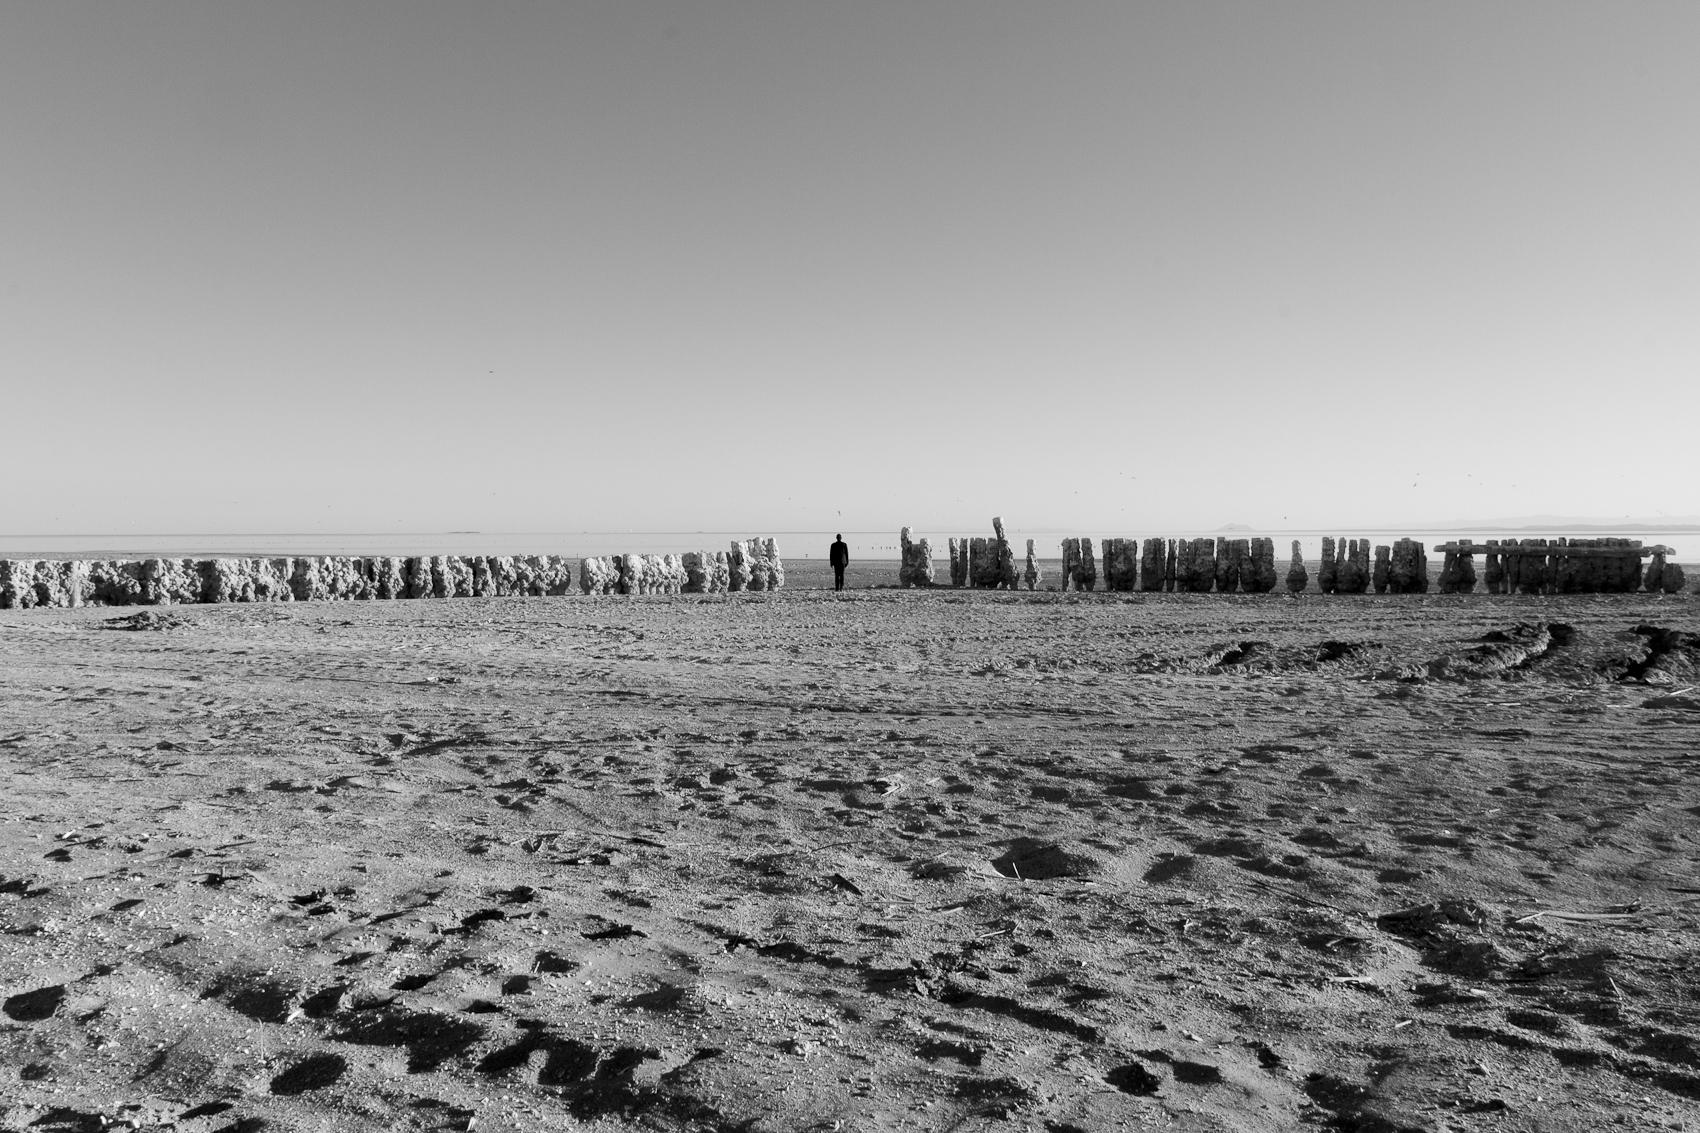 Self Portrait, Bombay Beach, Salton Sea, 2016